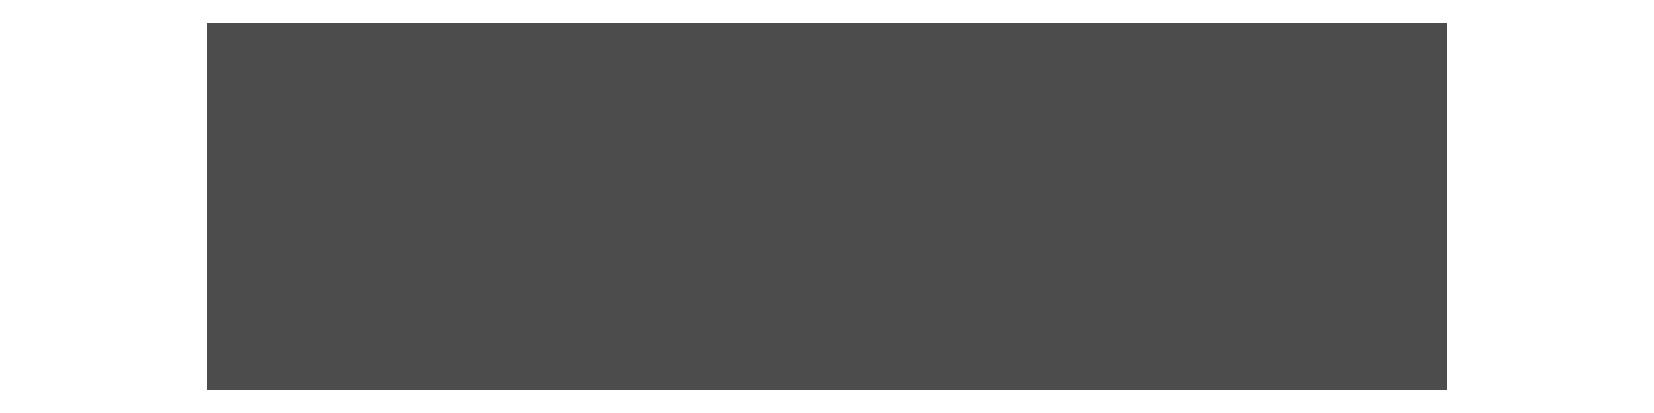 University_Surrey.png